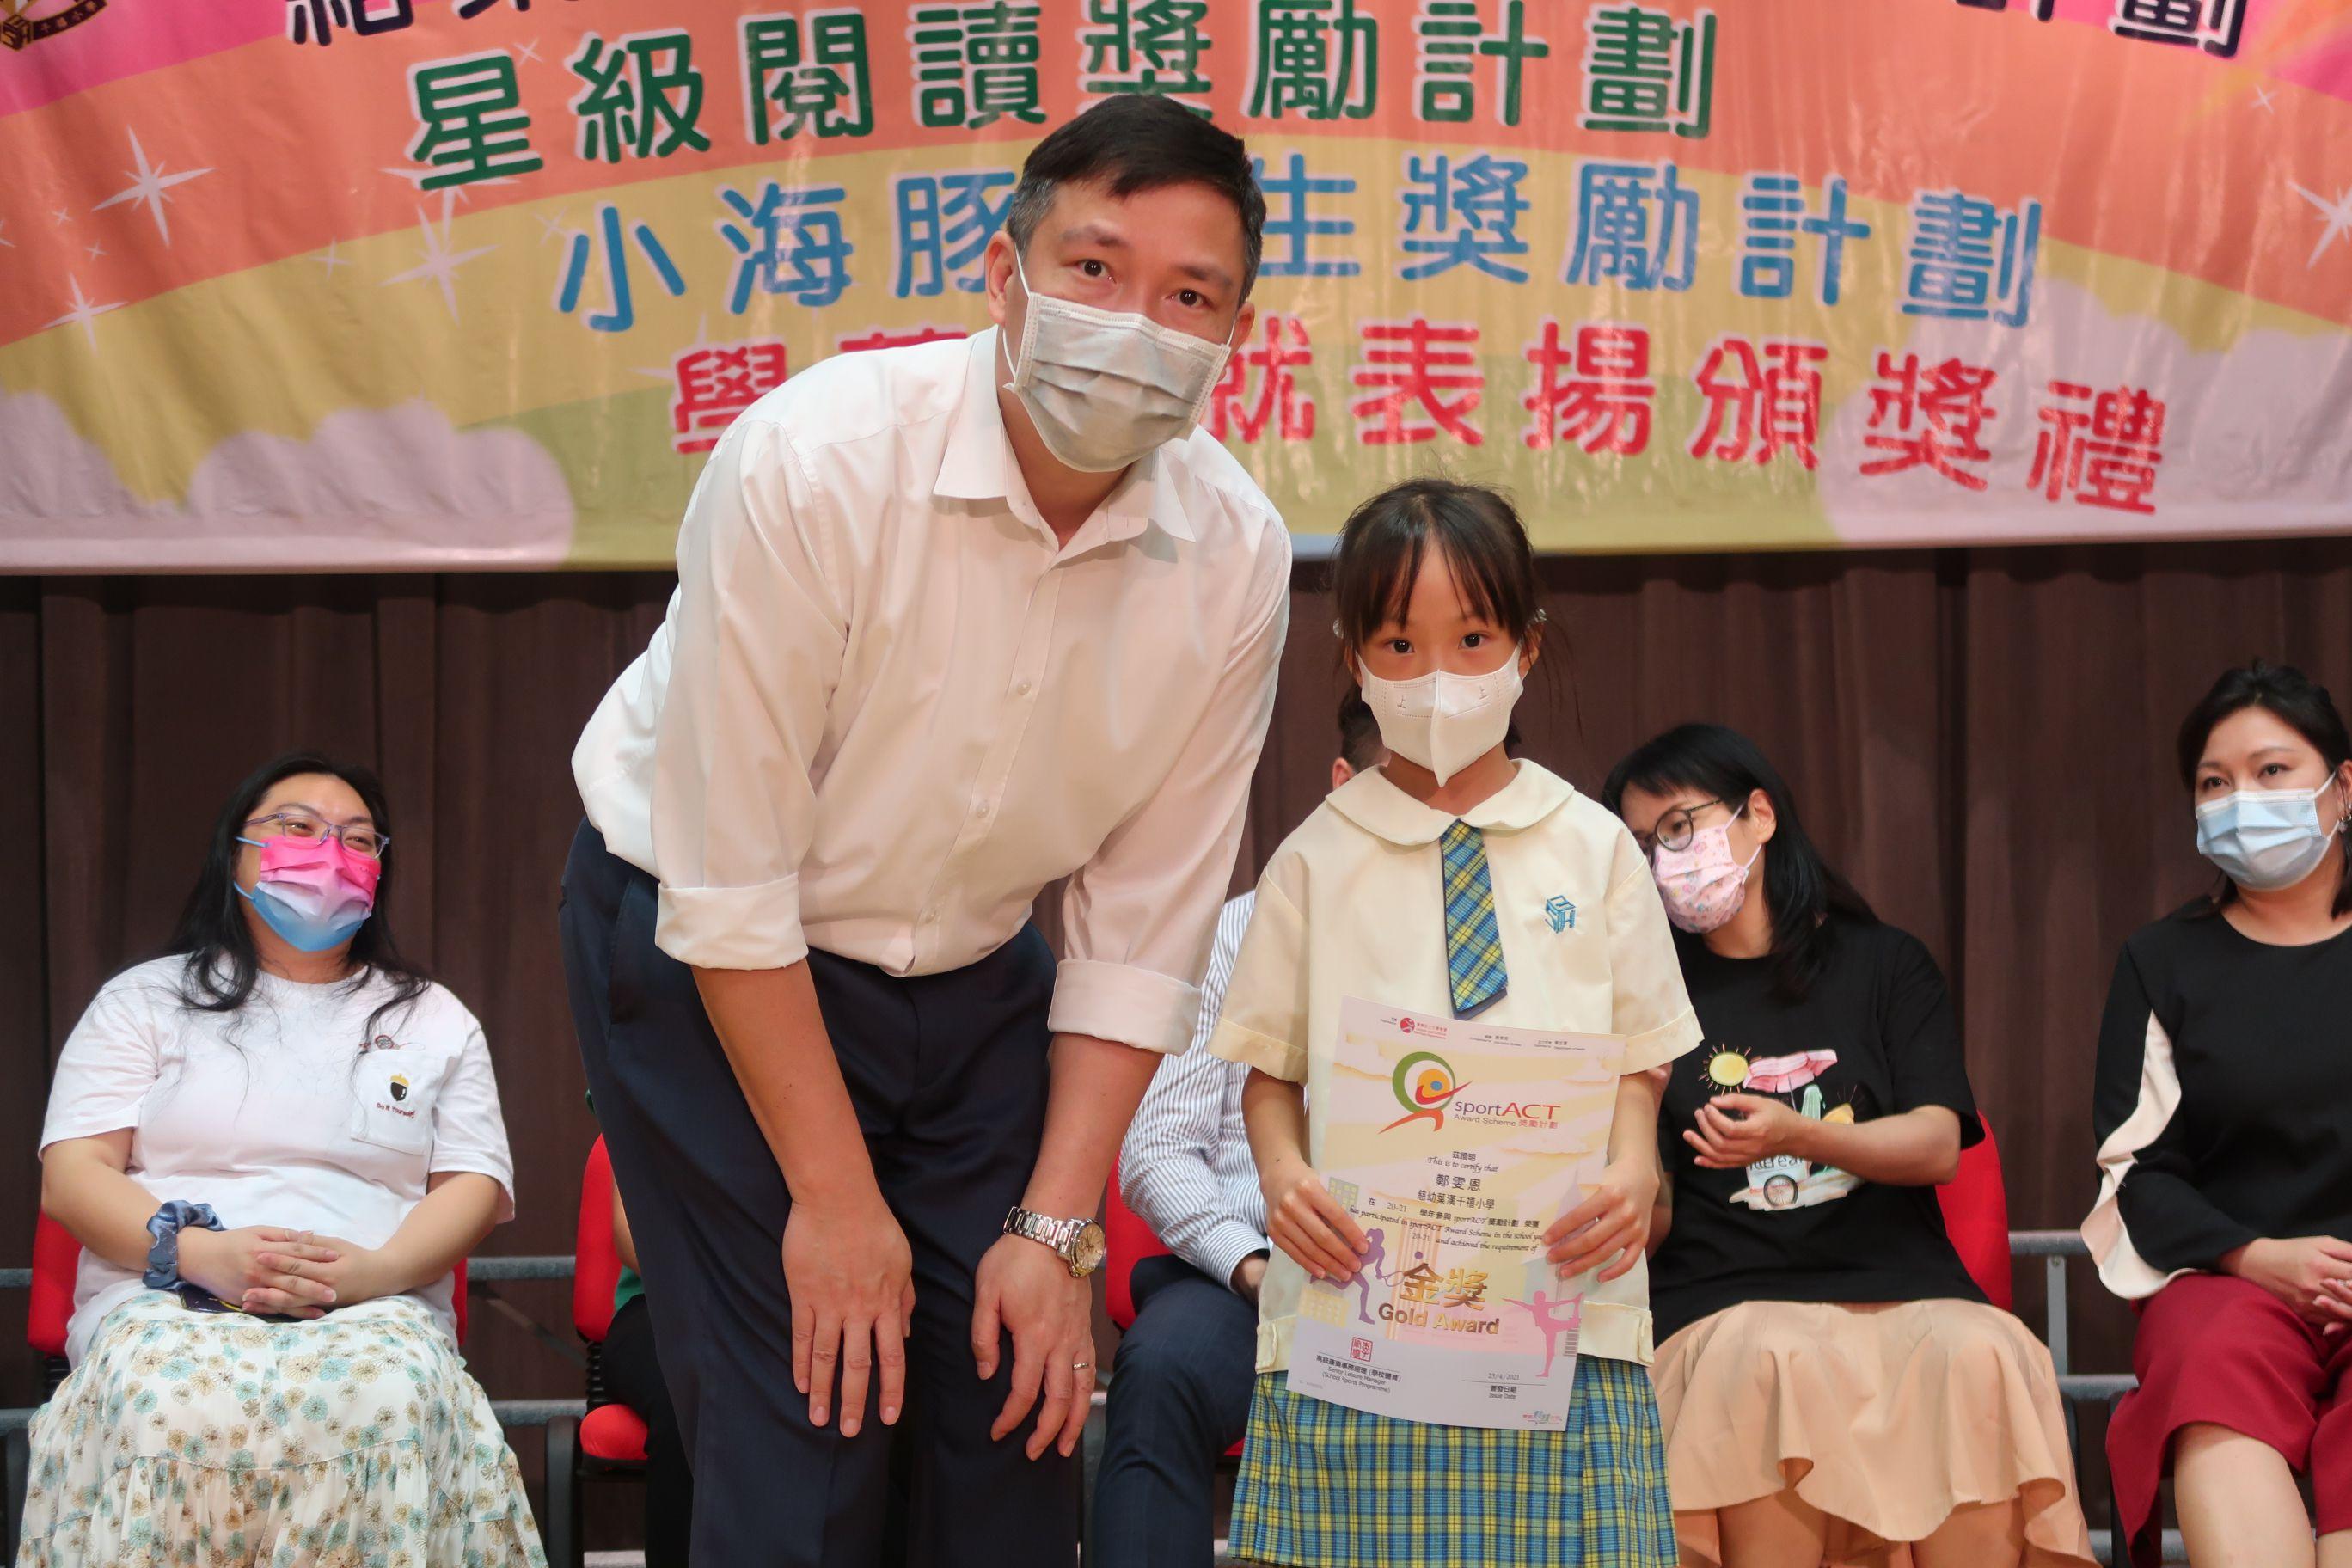 https://syh.edu.hk/sites/default/files/img_5890.jpg